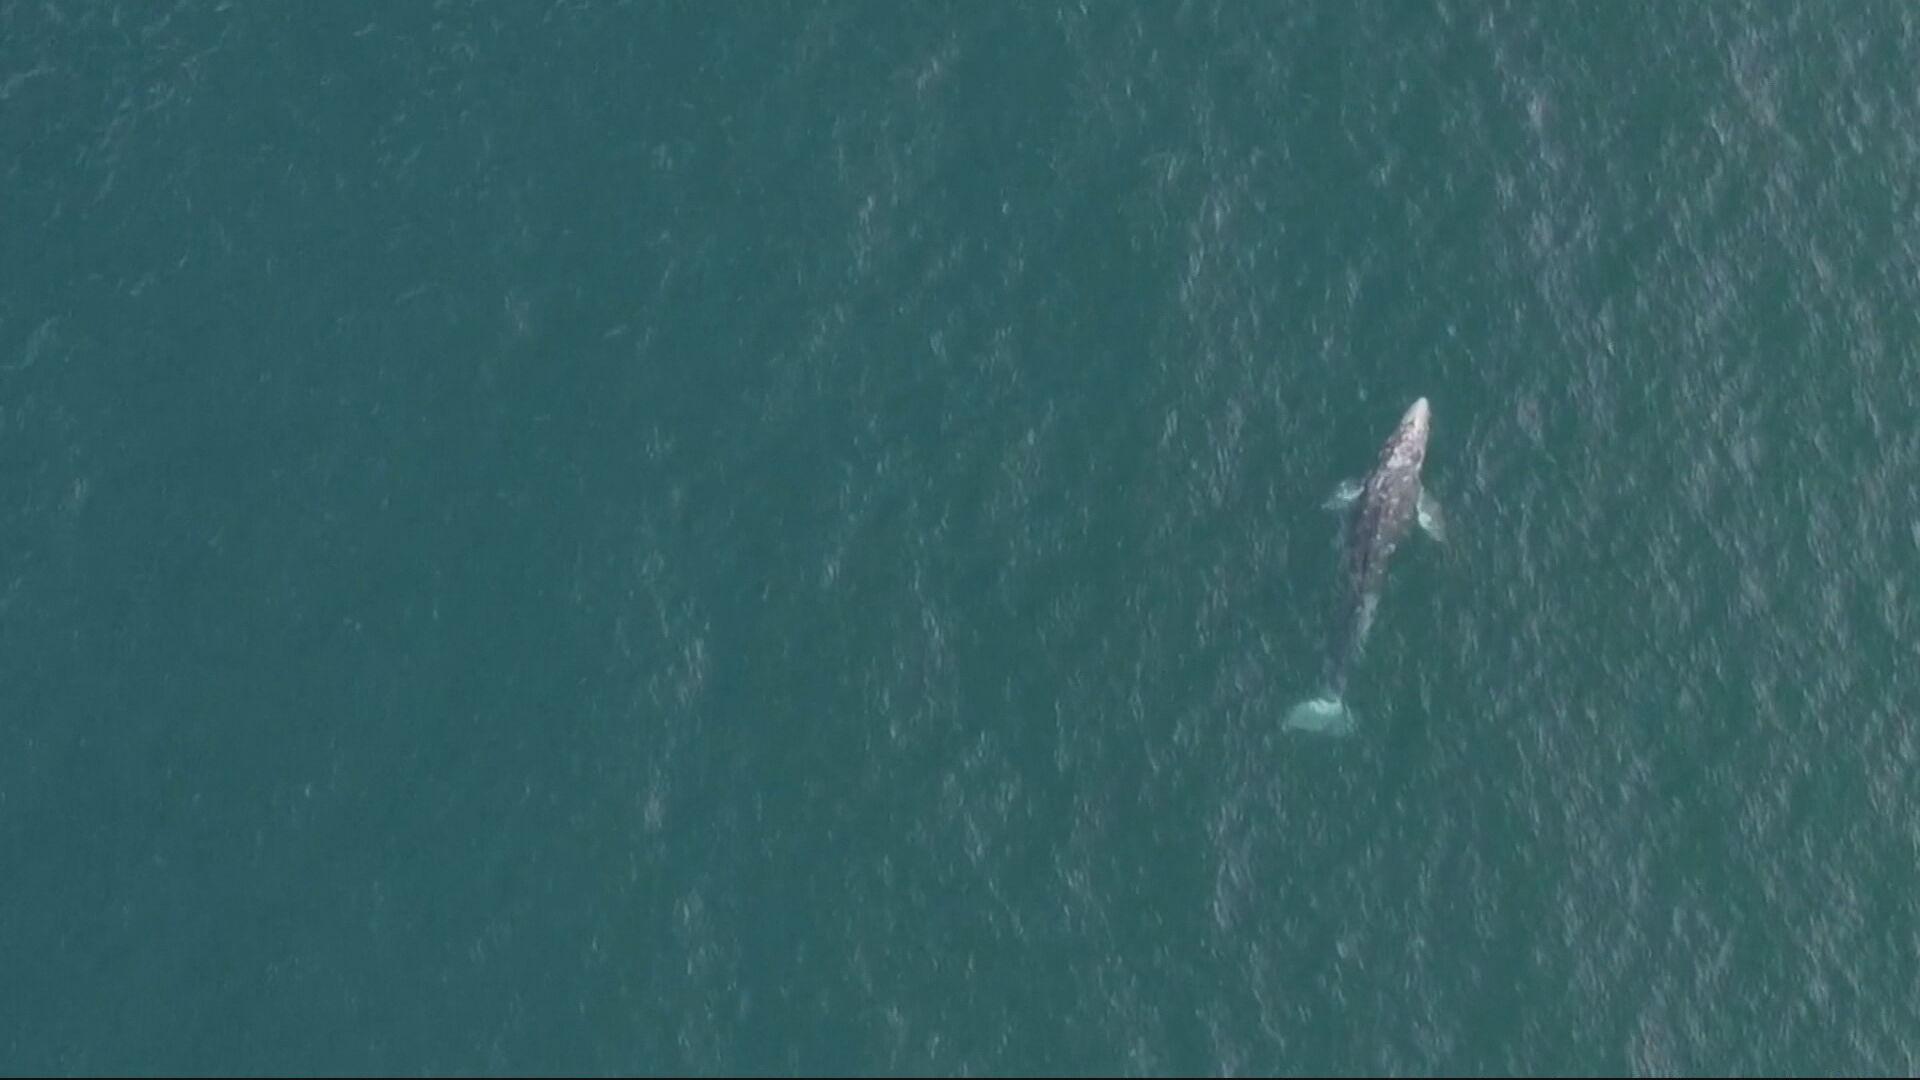 Baleia Wally se afastou de seu habitat natural